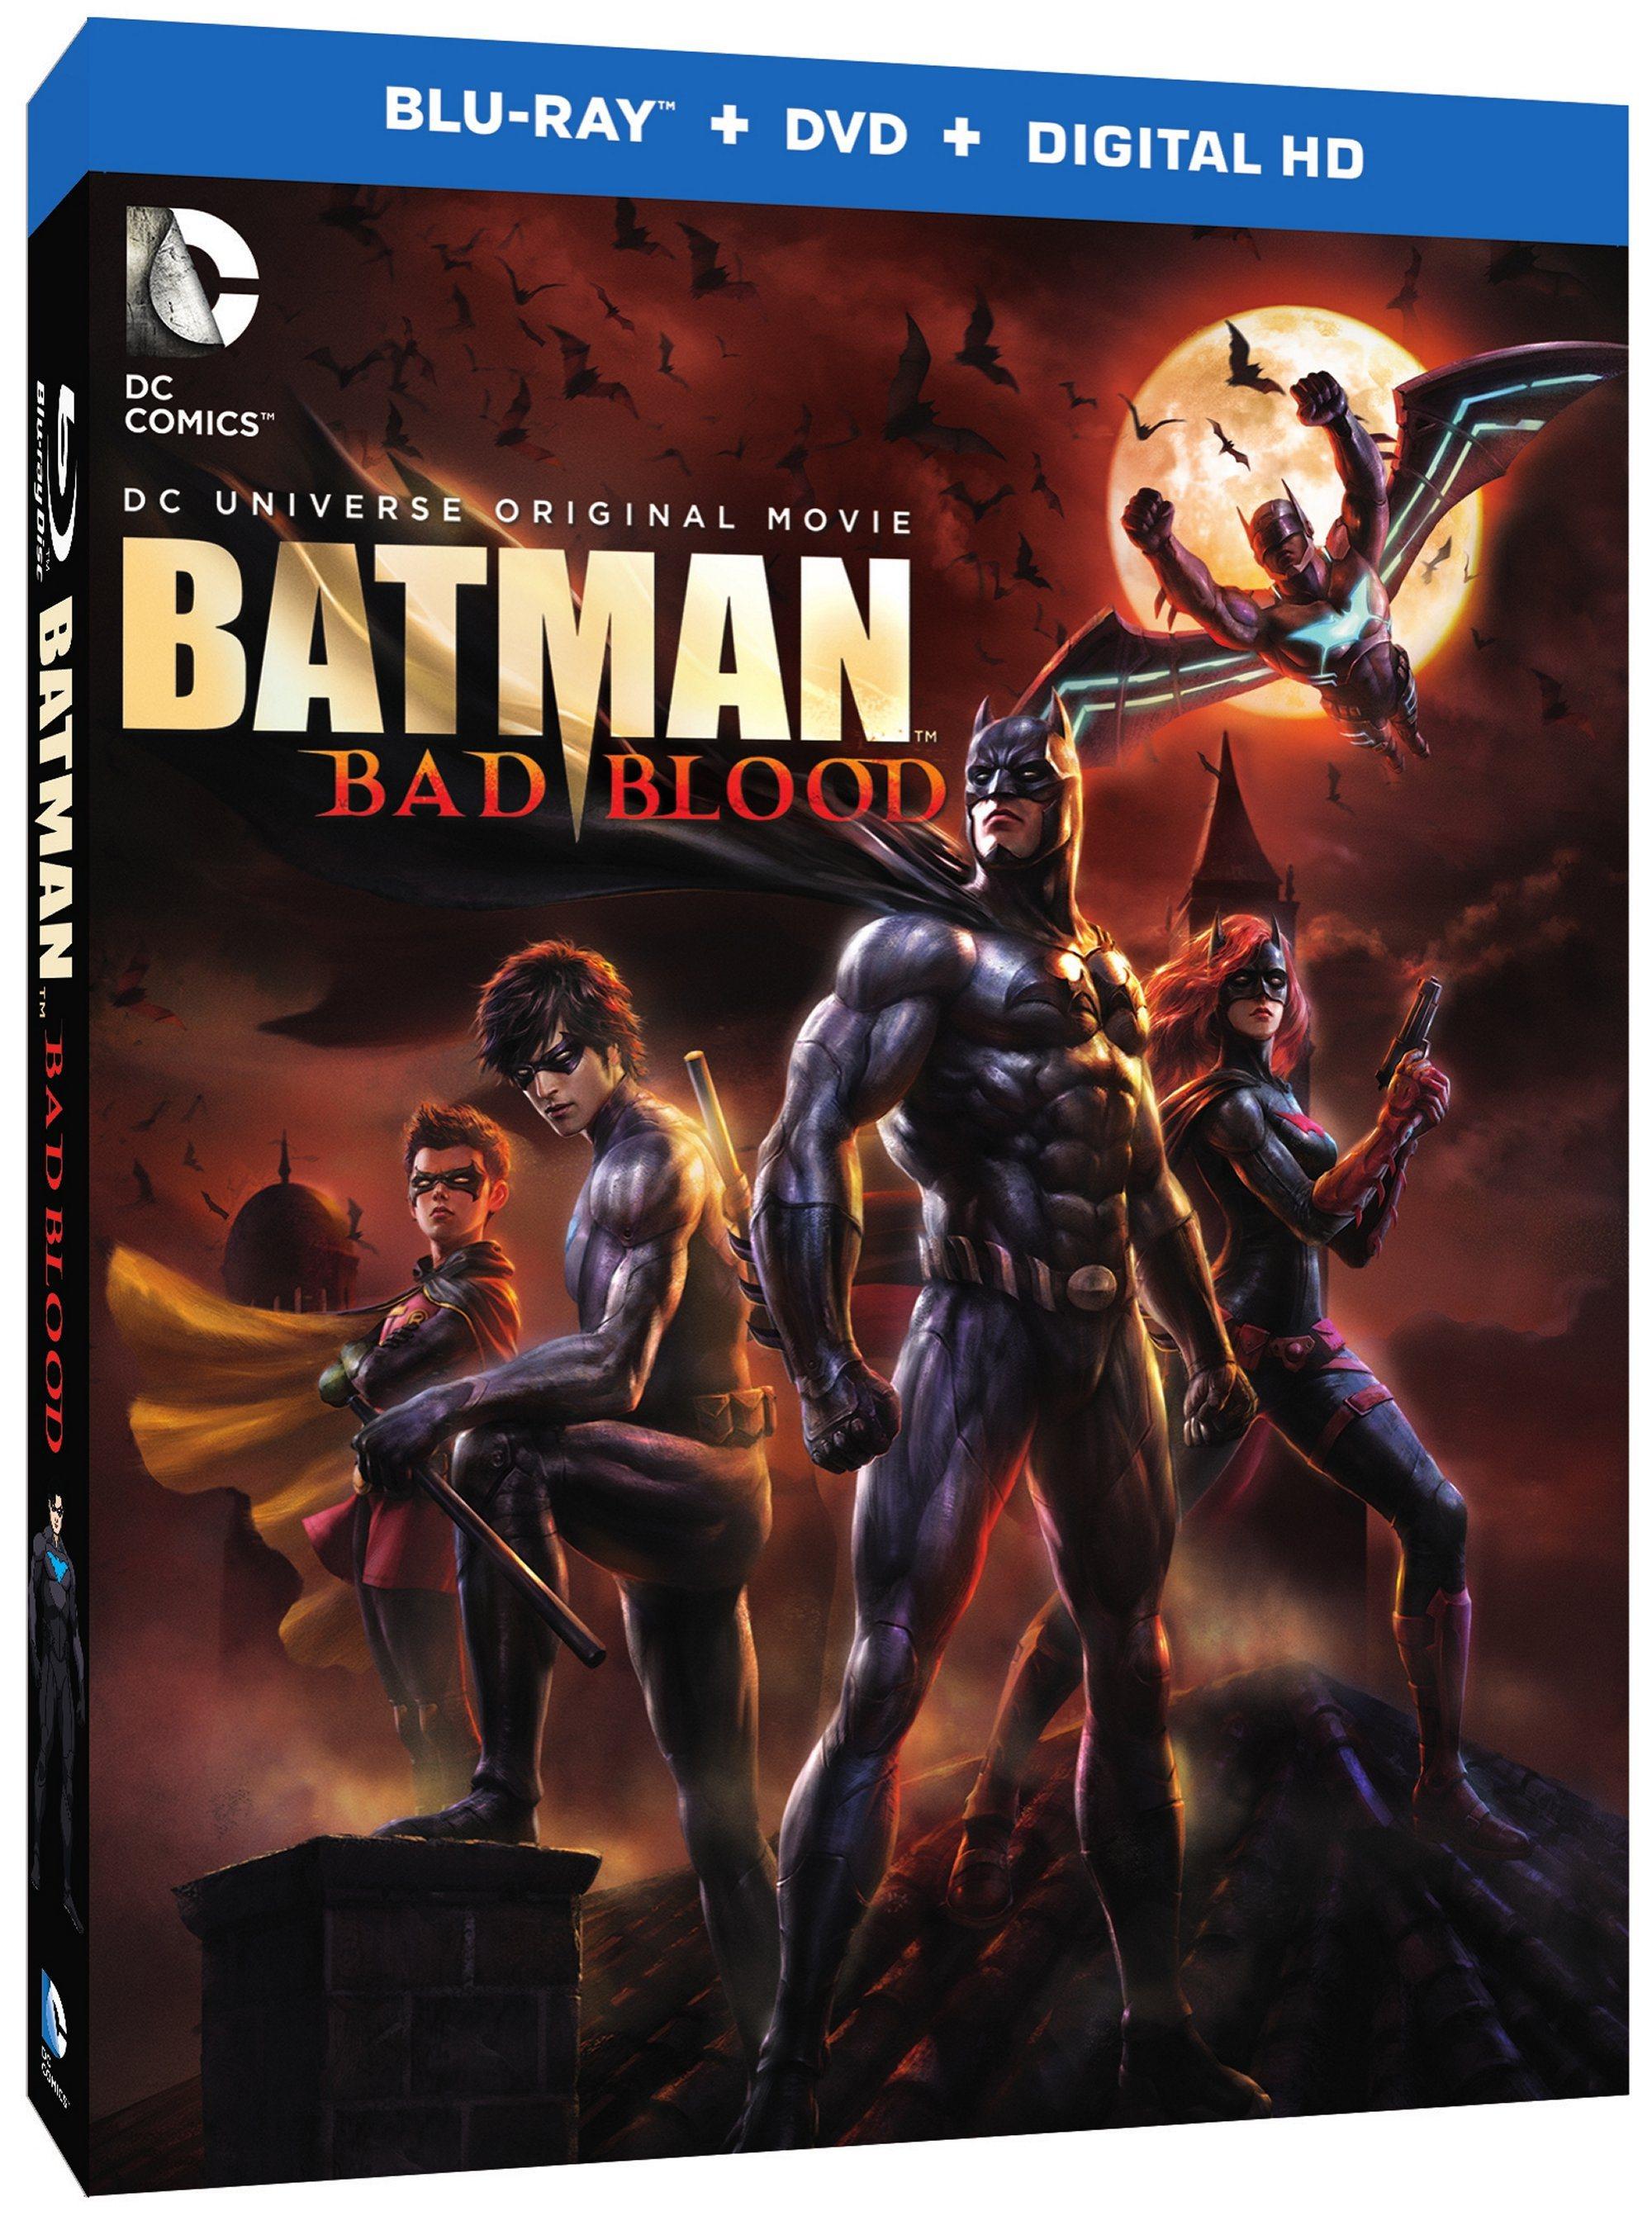 Dc Animated Movies Batman Bad Blood 2016 Bad Blood Batman Nightwing